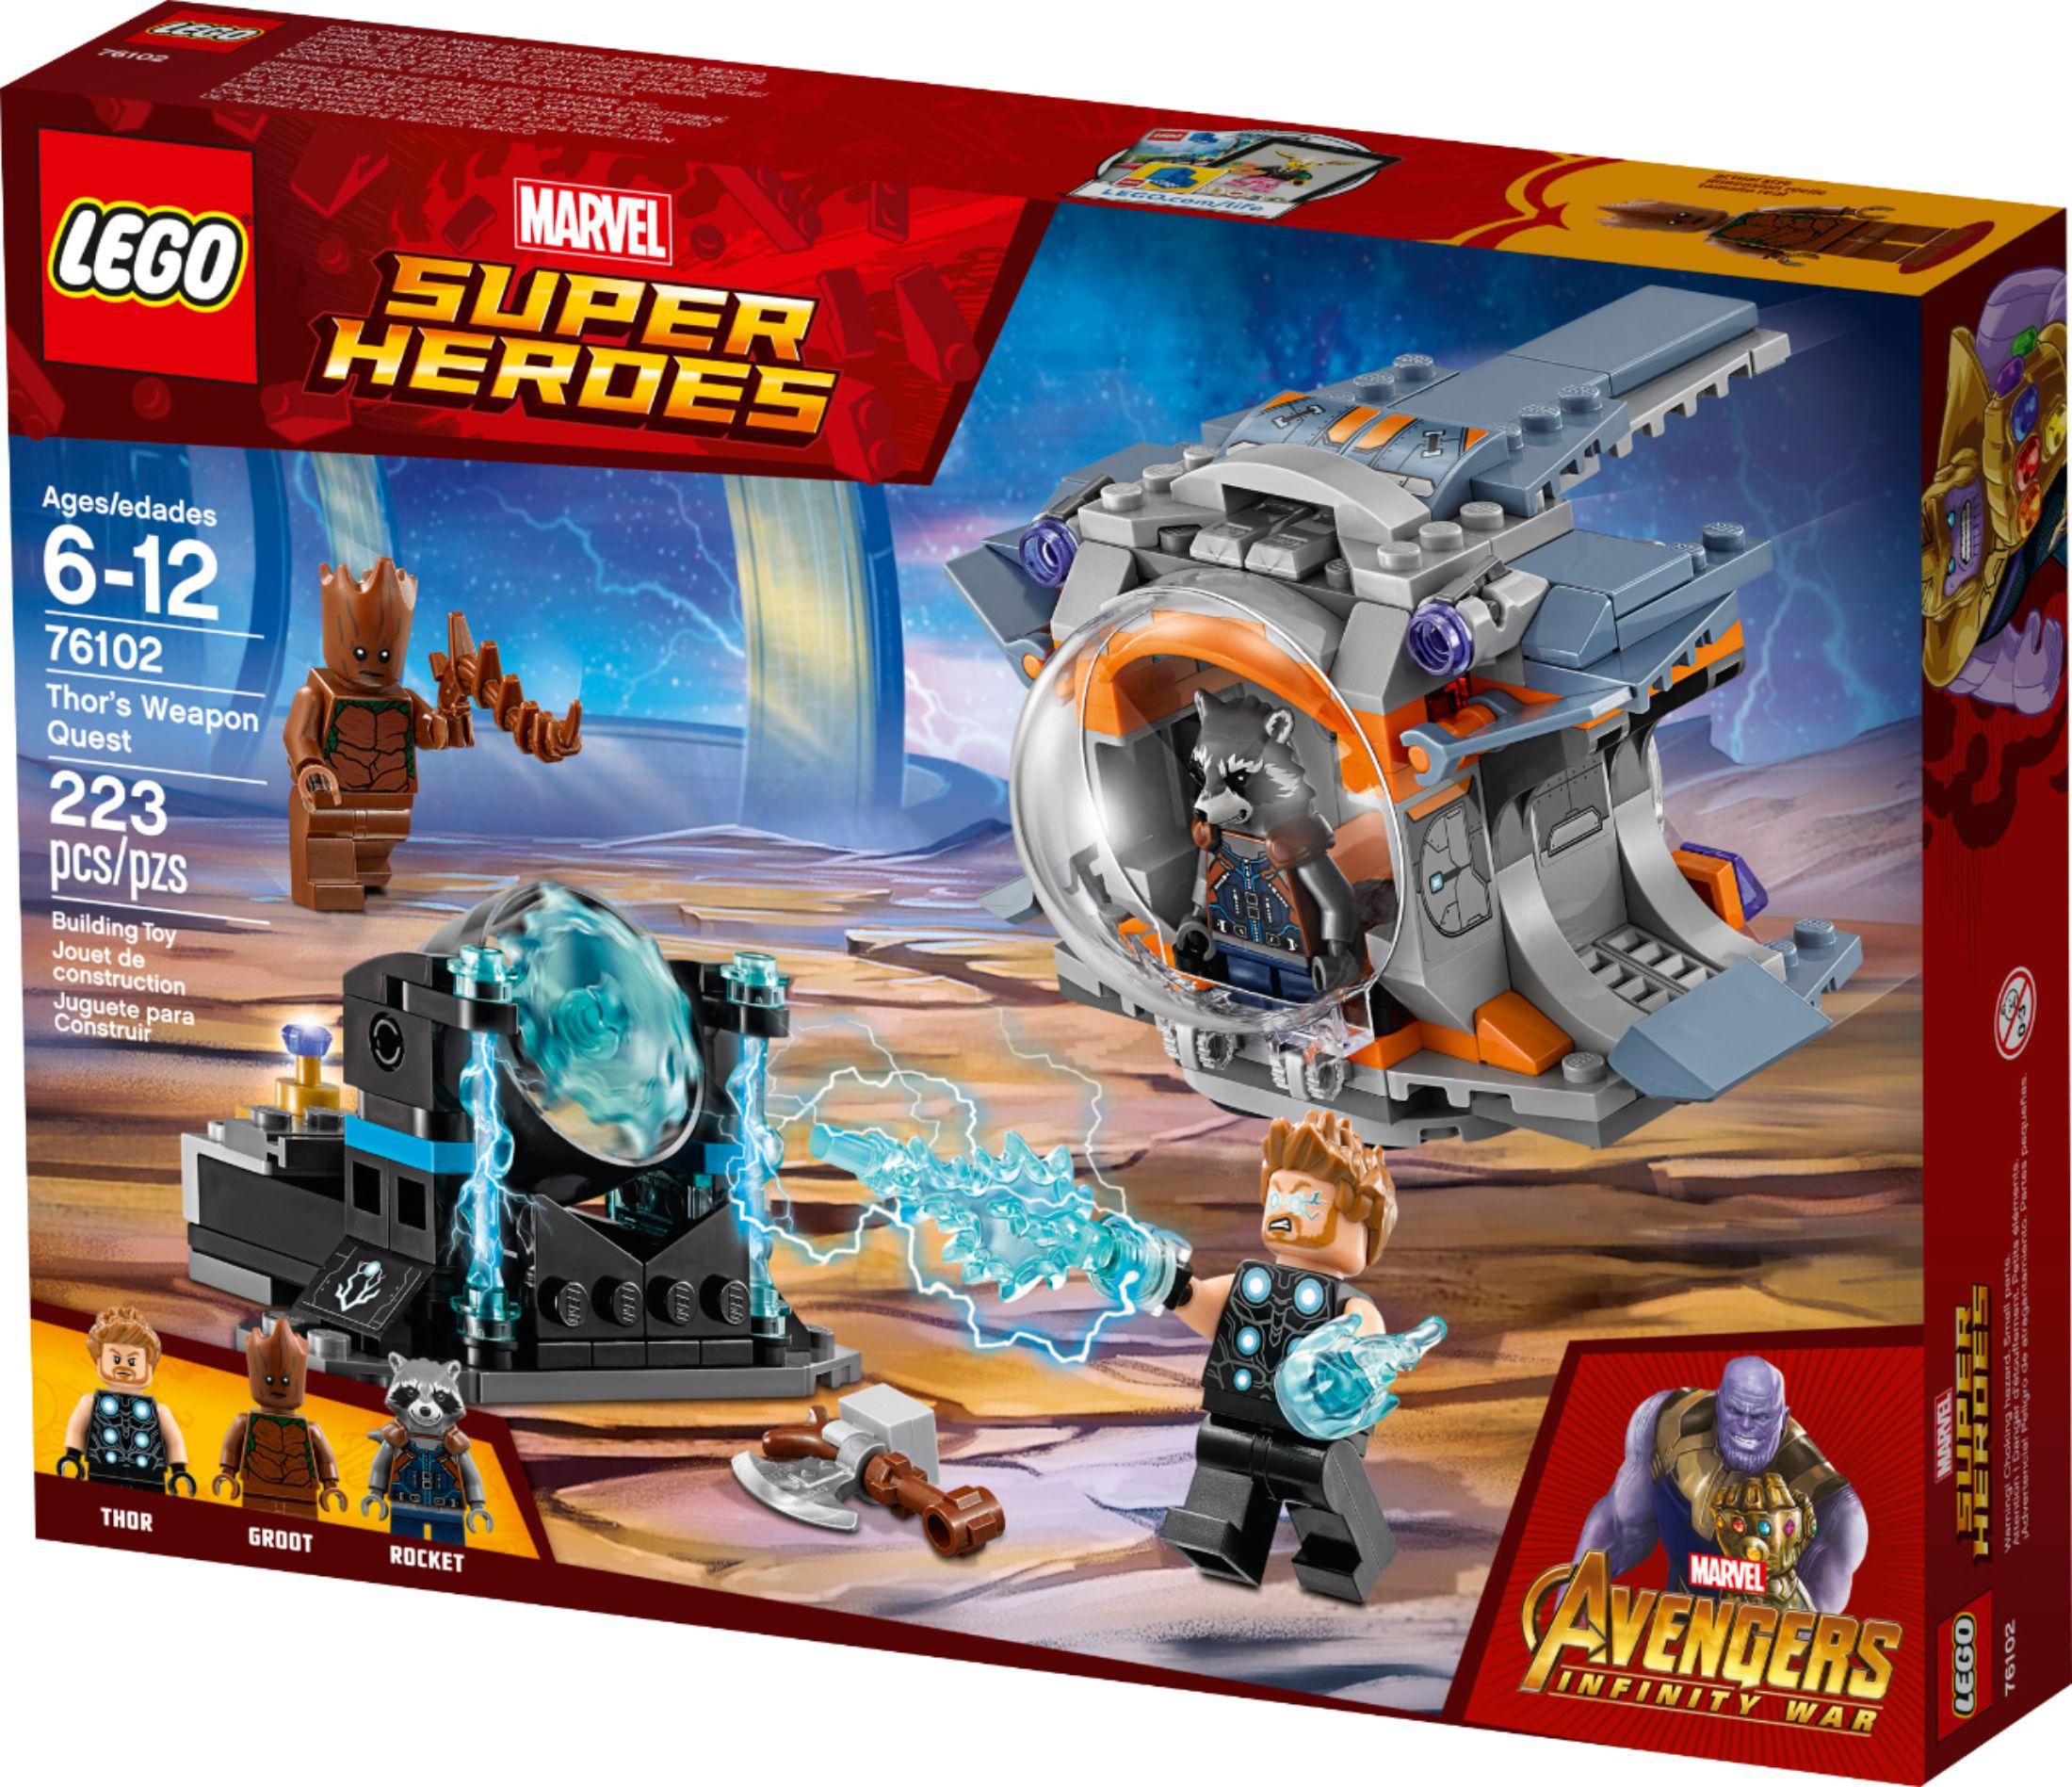 GENUINE Set of 6 Infinity Stones! LEGO Avengers Infinity War